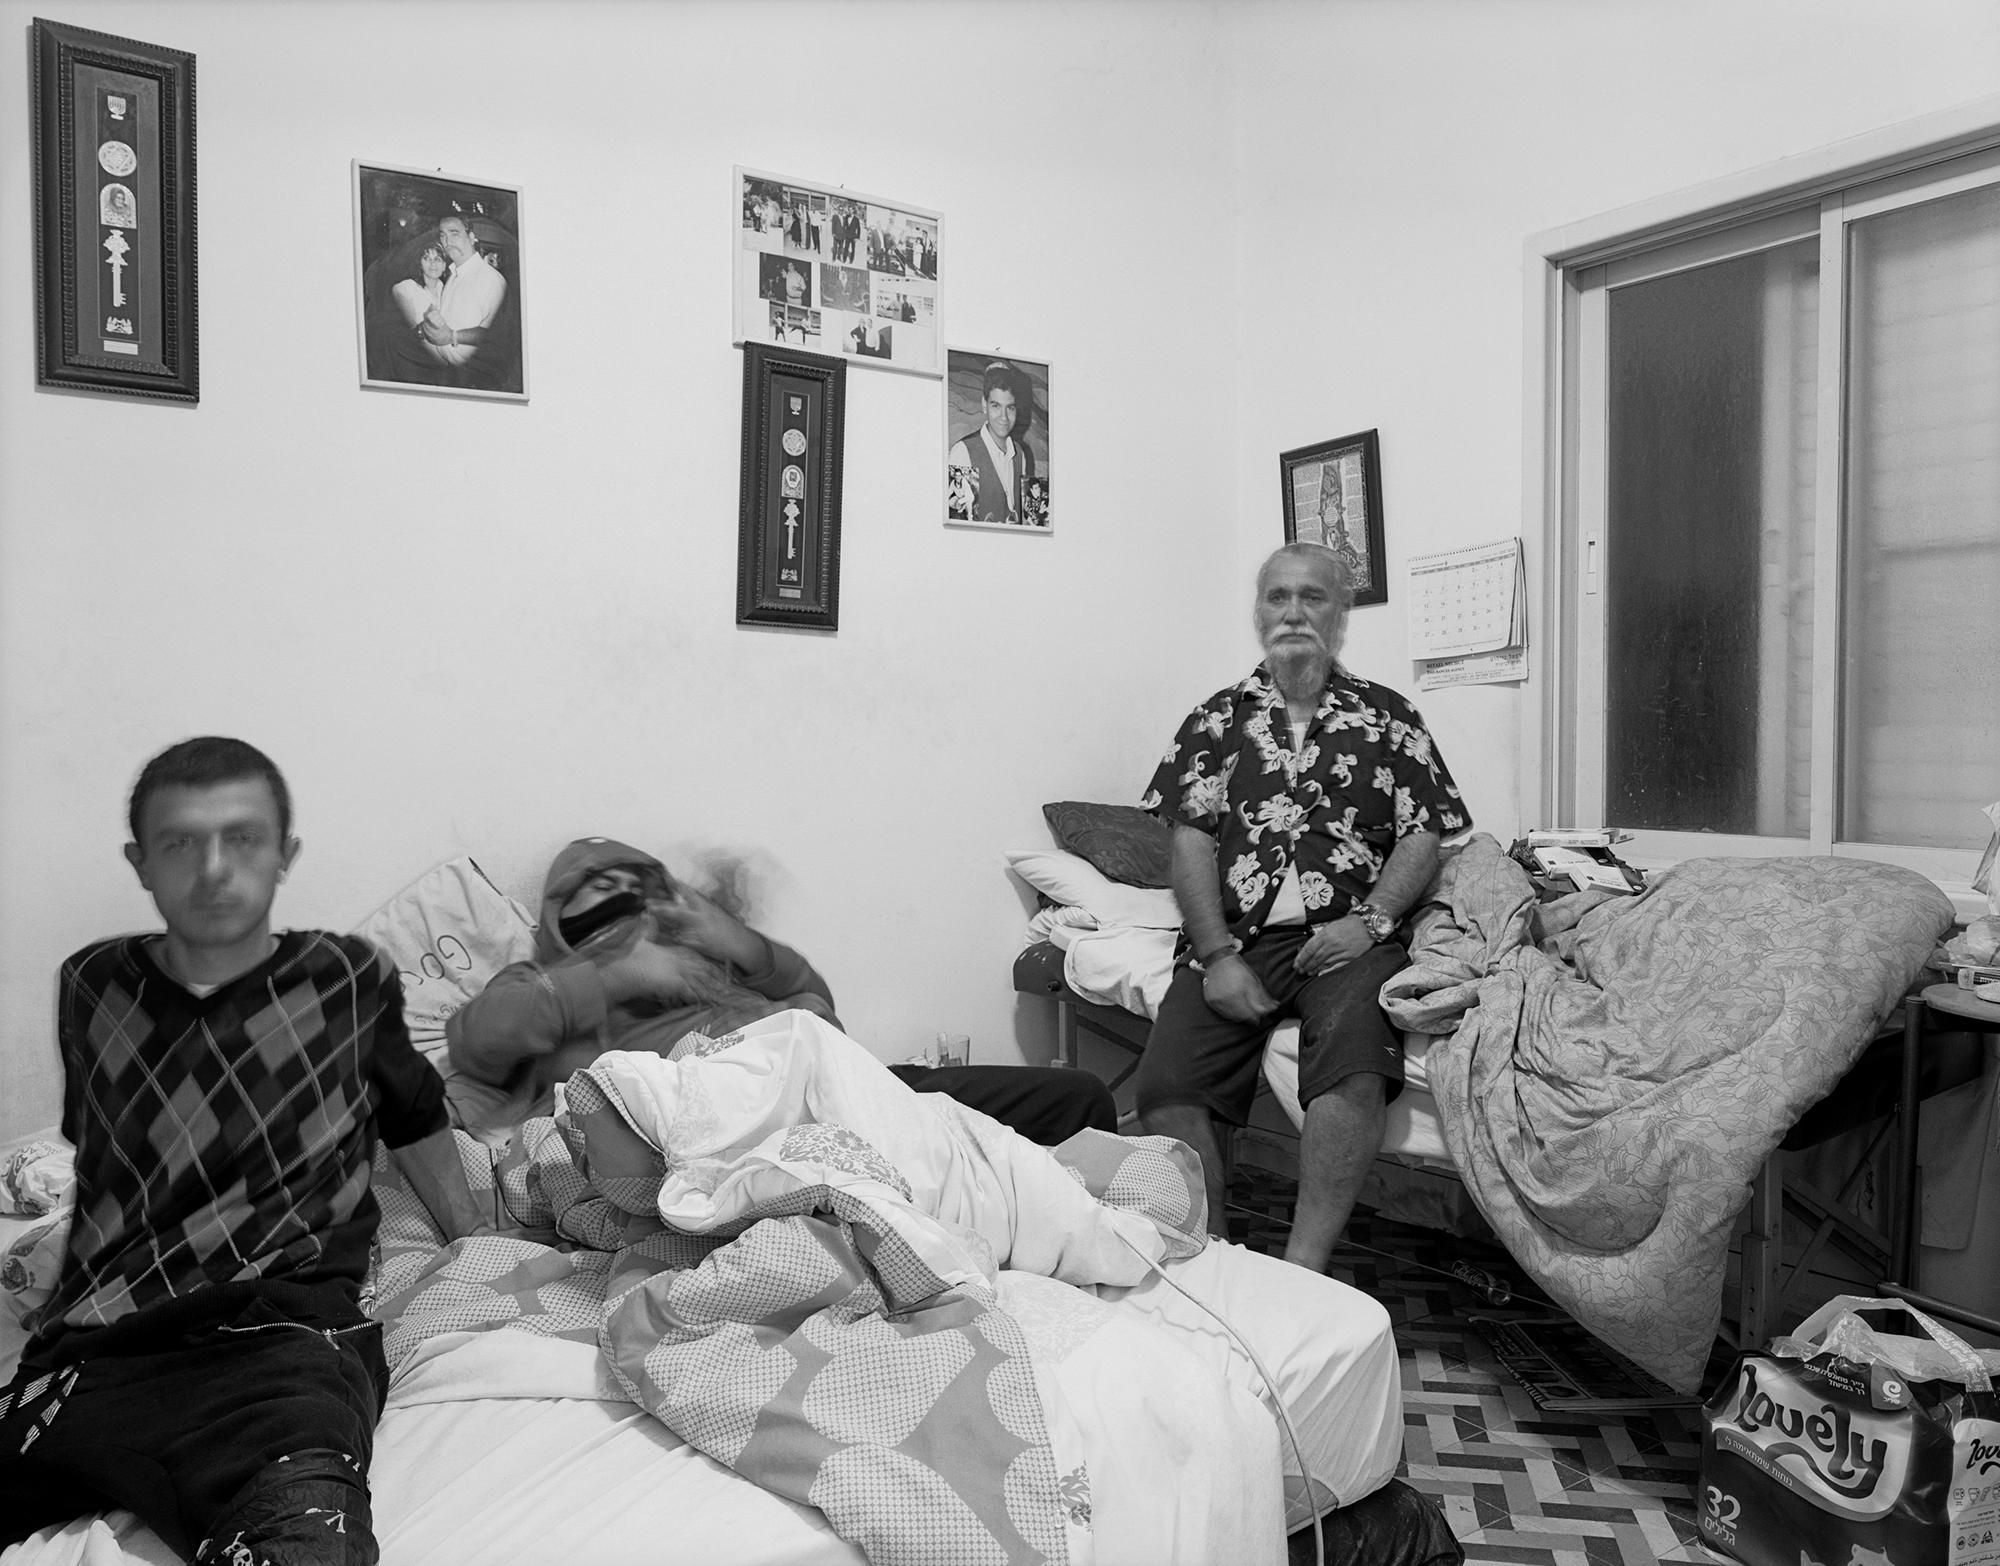 A. and E. living room (Israel) Neve Sha'anan 2015